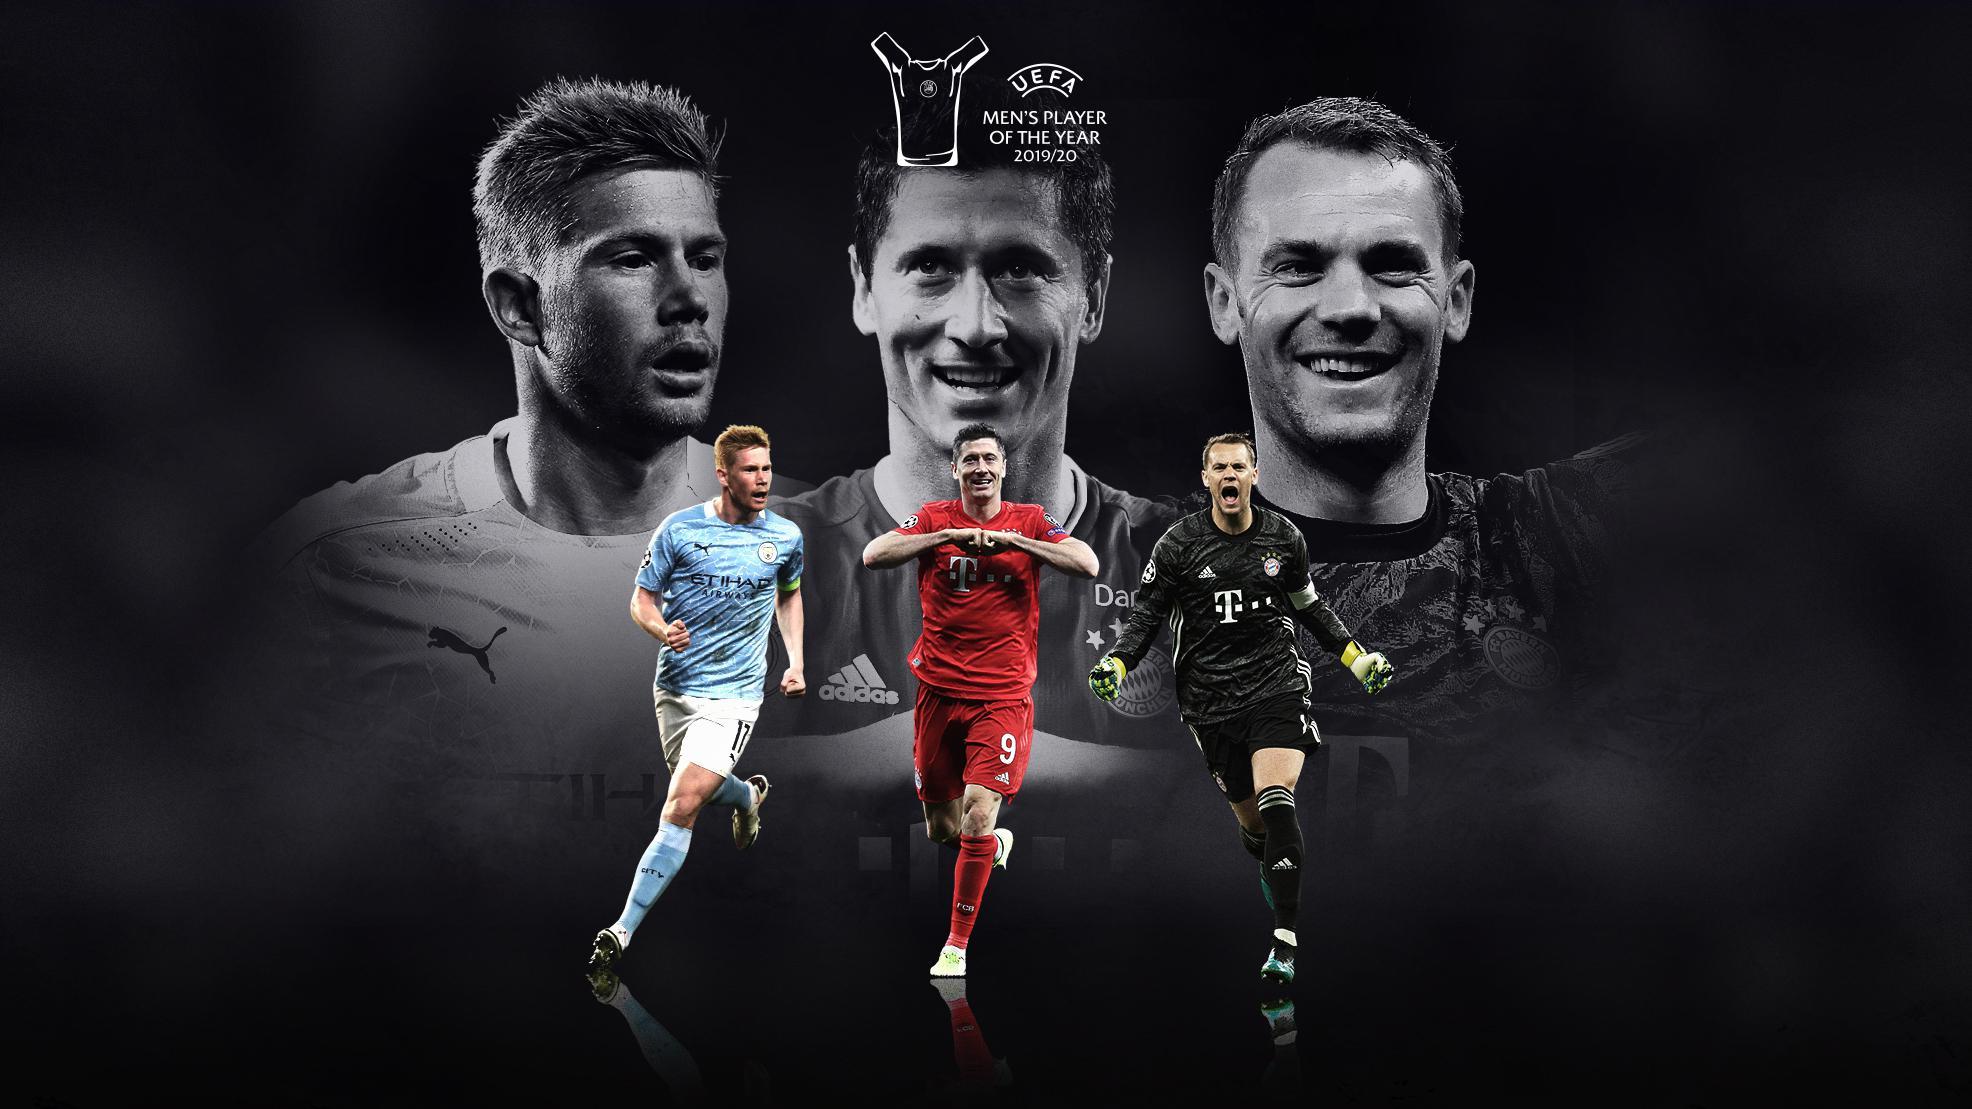 UEFA Men's Player of the Year: De Bruyne, Lewandowski or Neuer | UEFA  Champions League | UEFA.com